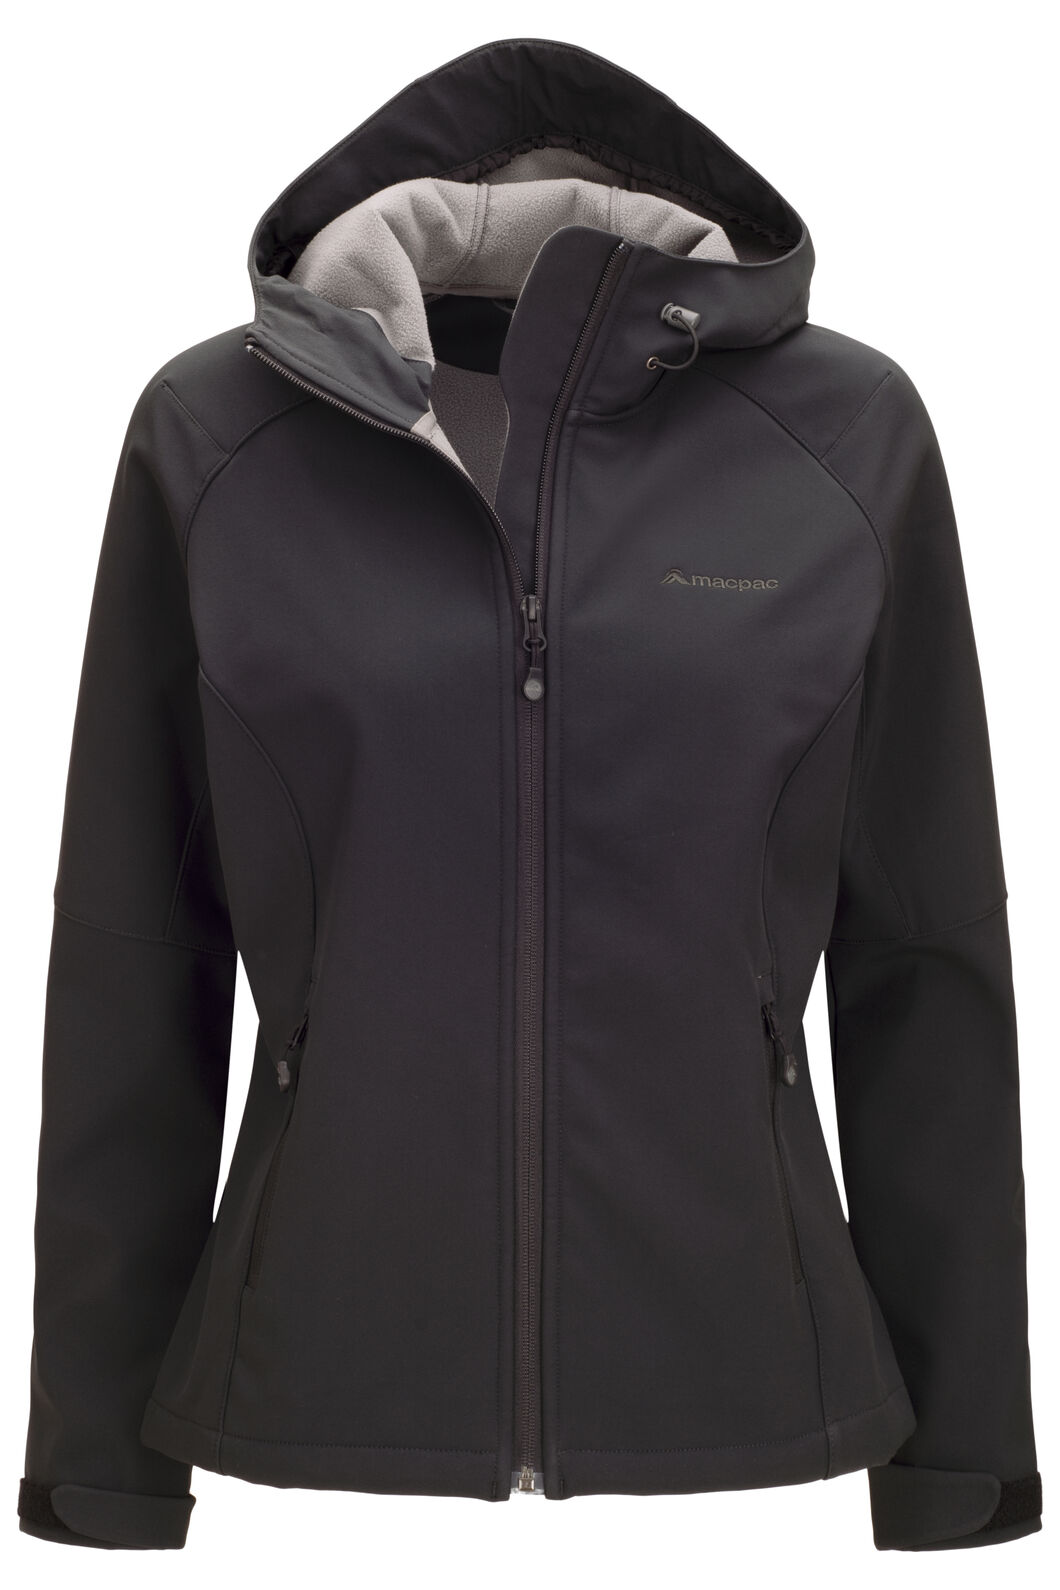 Macpac Women's Sabre Hooded Softshell Jacket, Black, hi-res